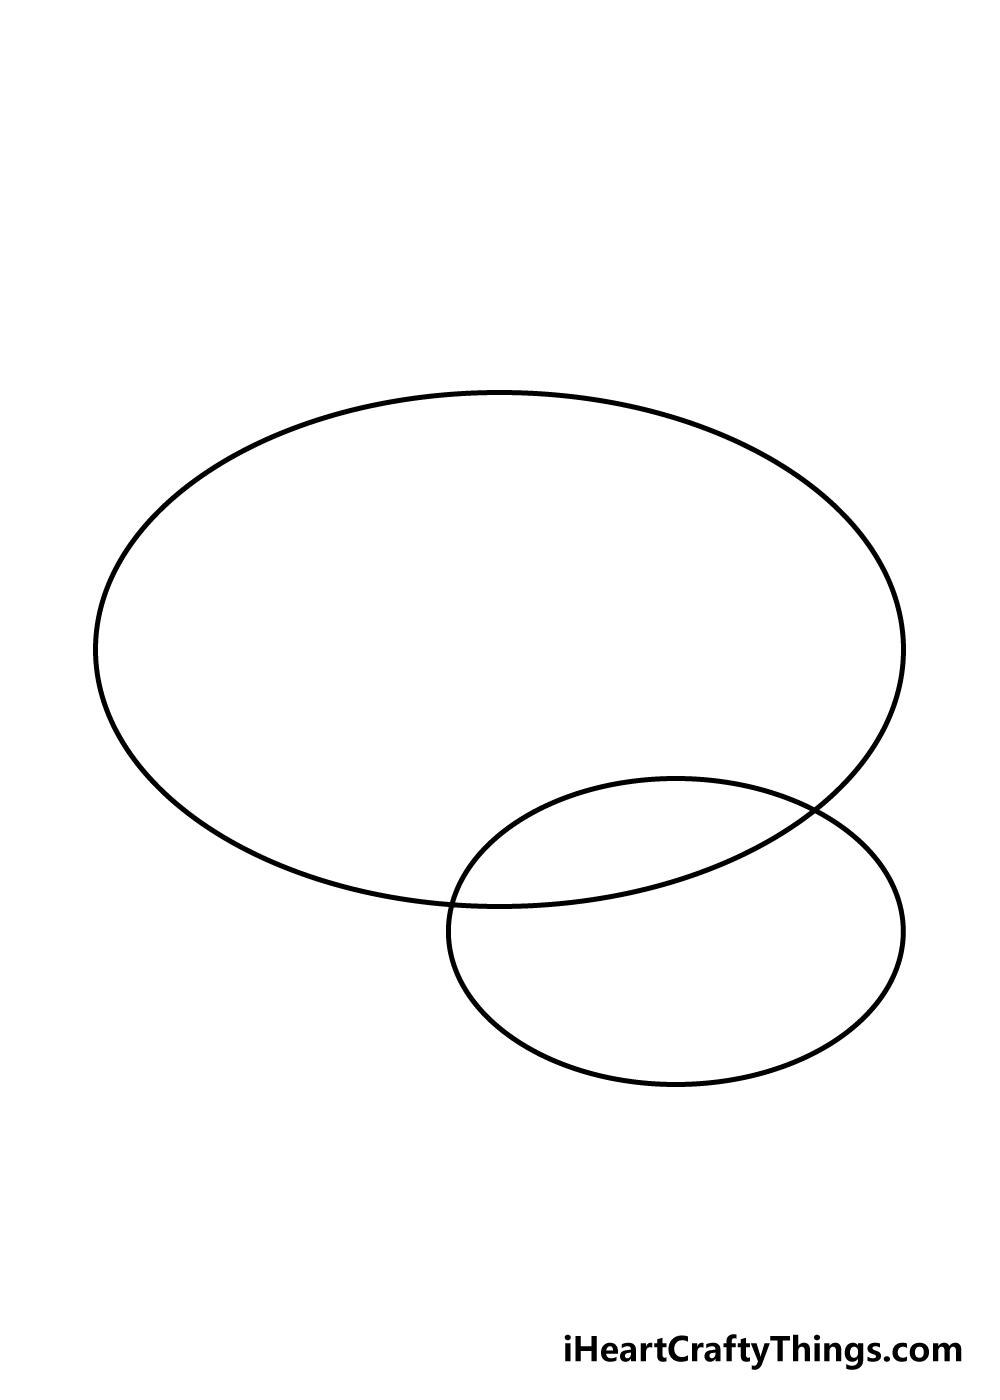 brain drawing step 1